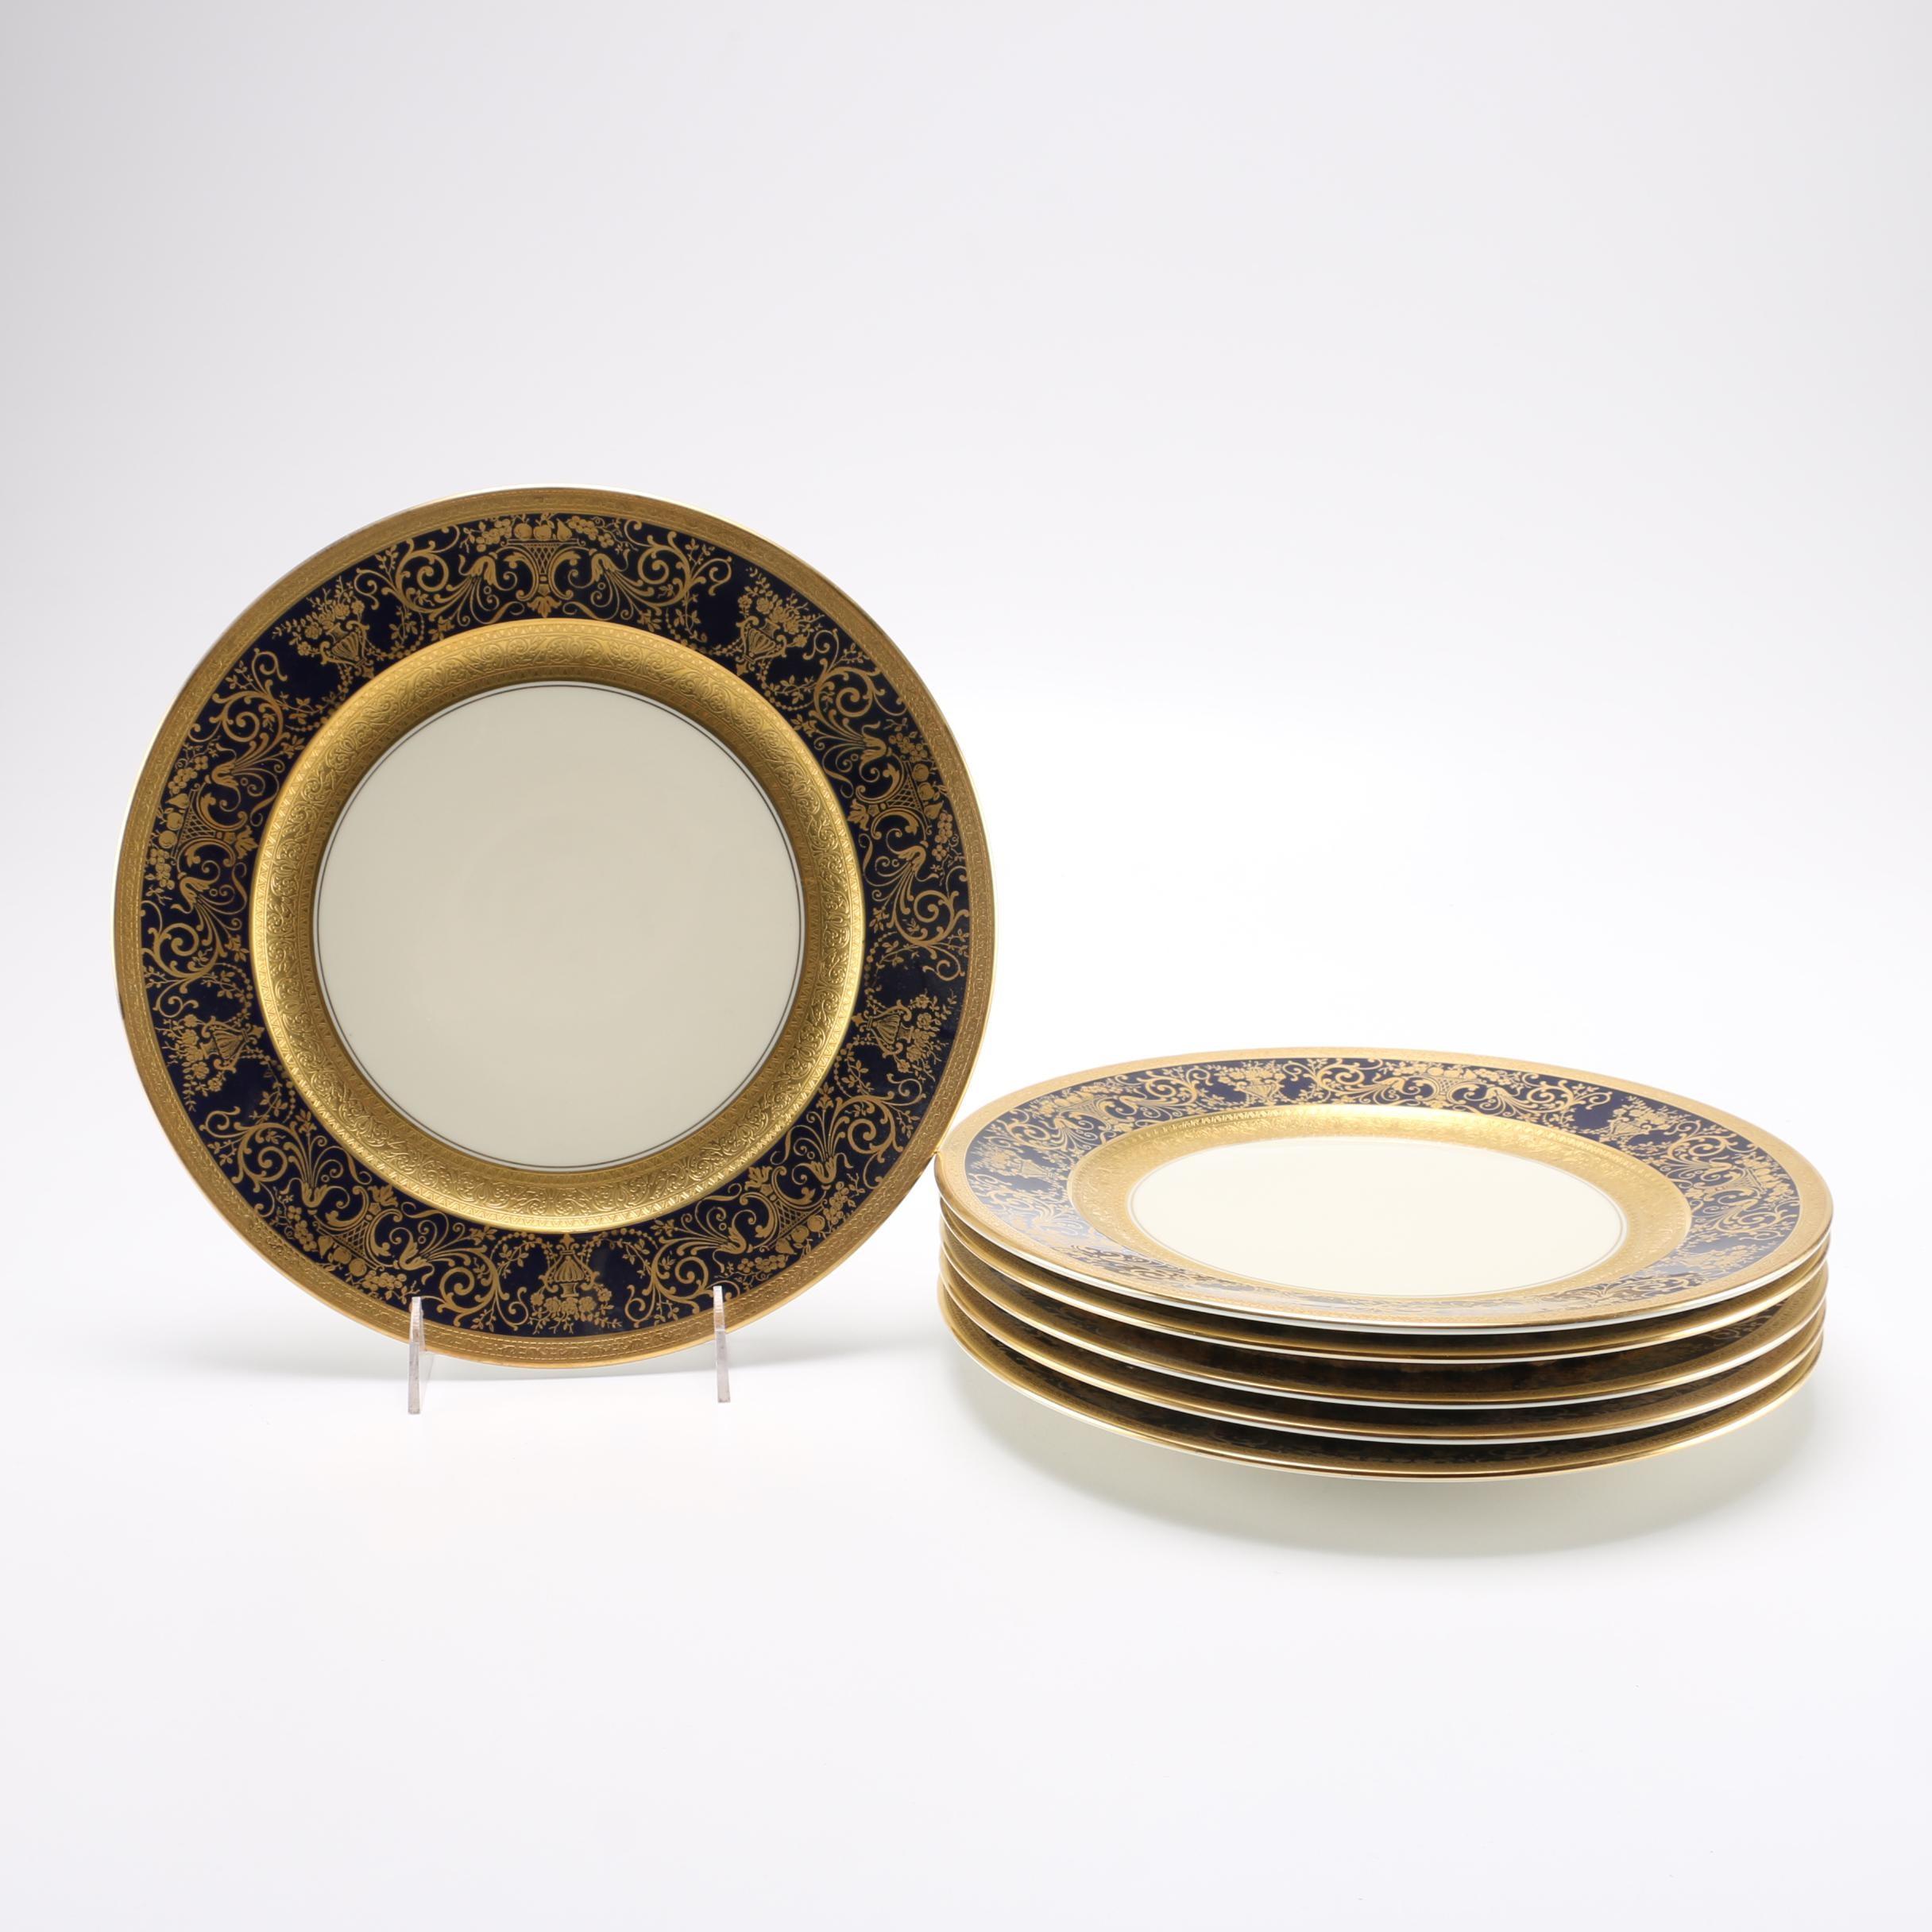 Gold Tone Ovingtons China Dinner Plates